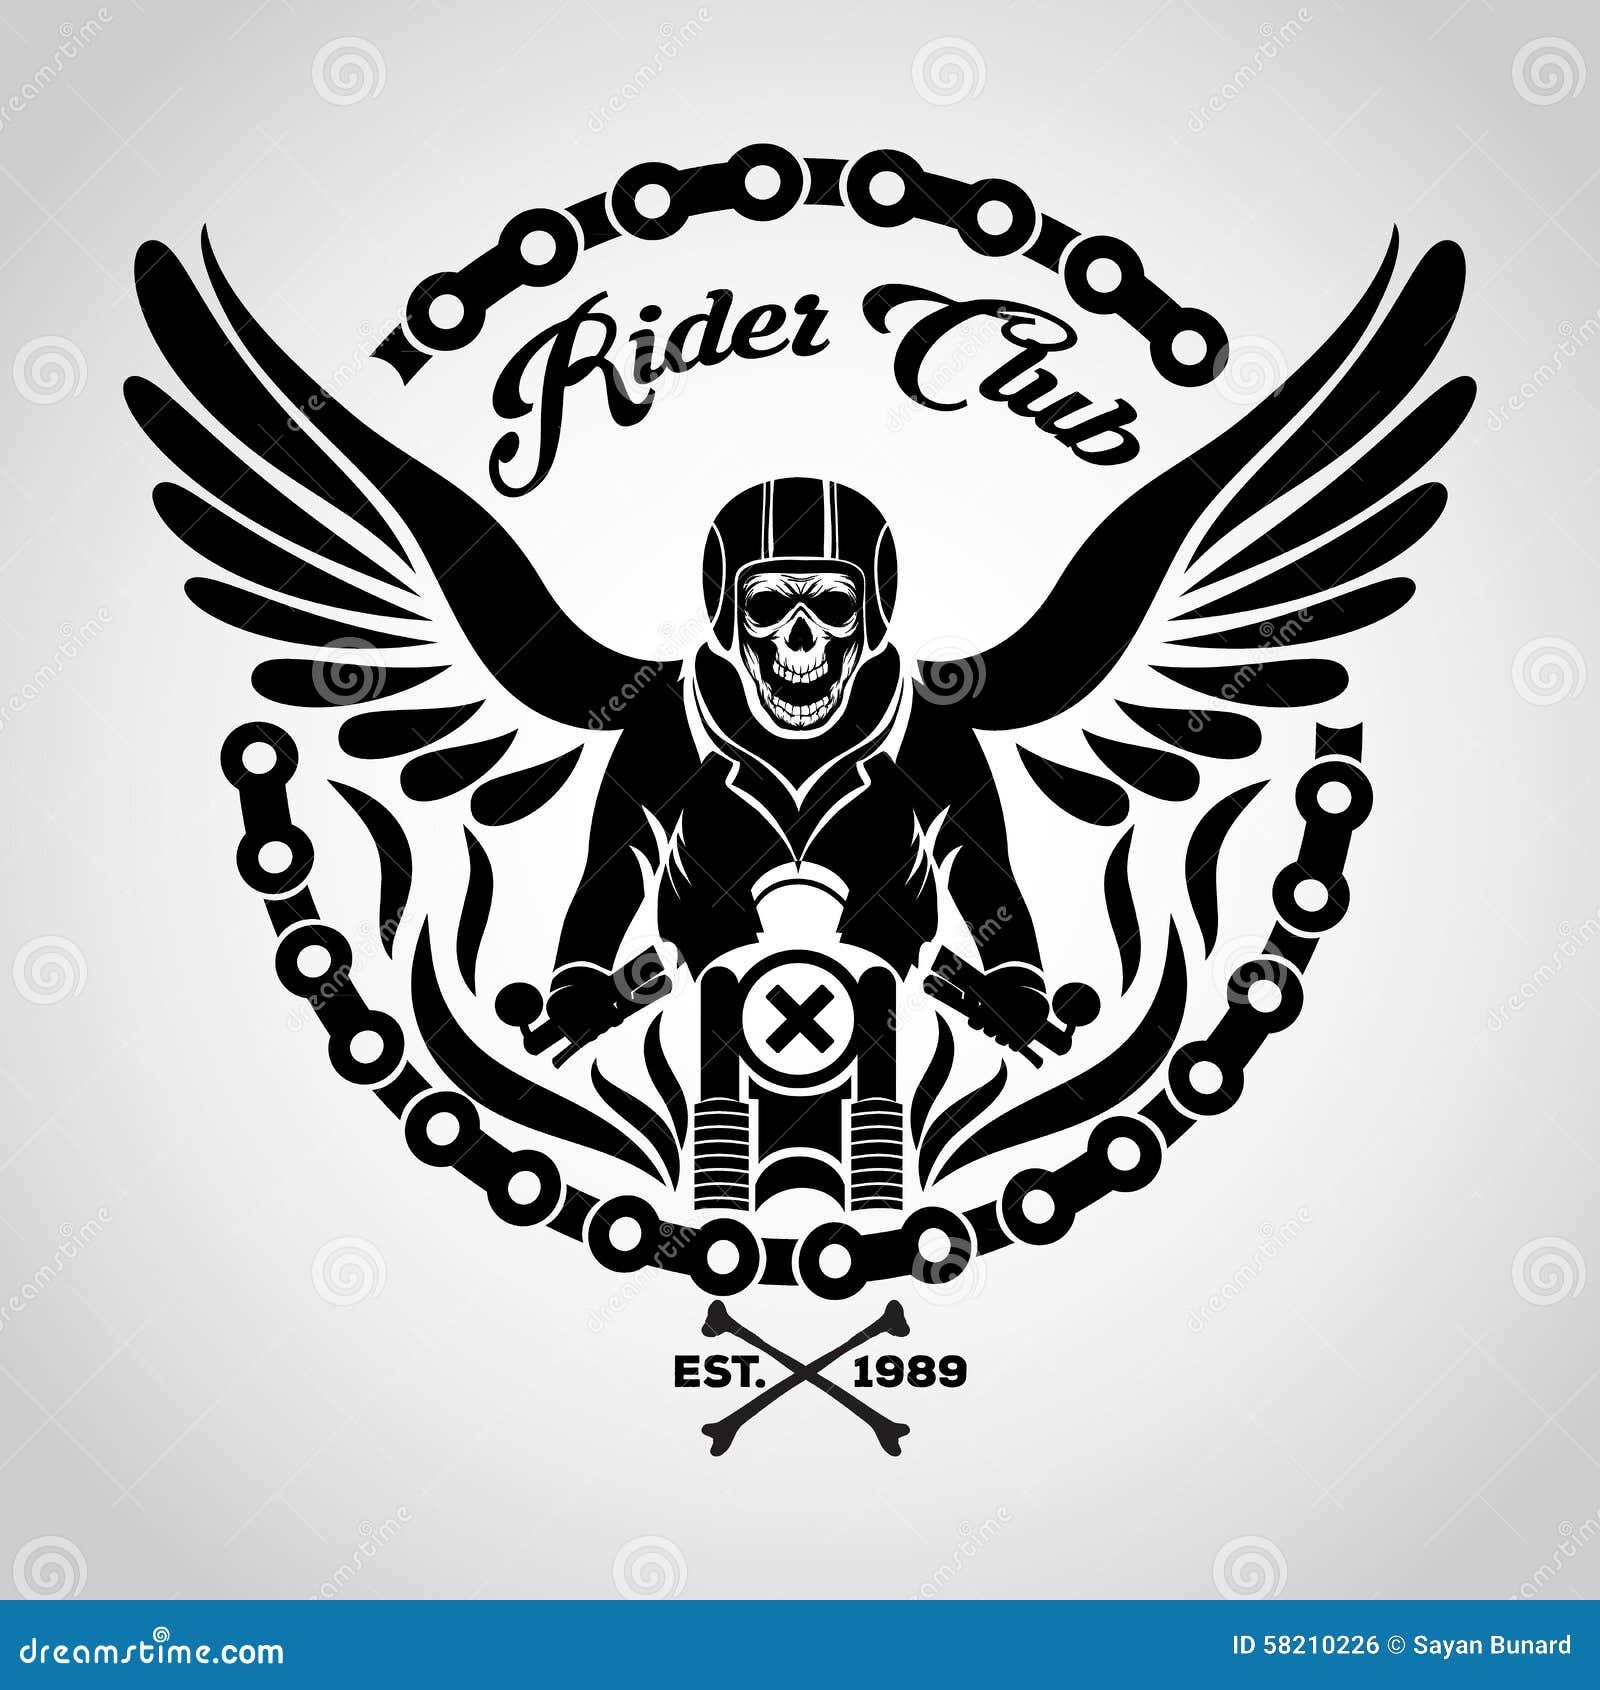 Bike Stickers Design Free